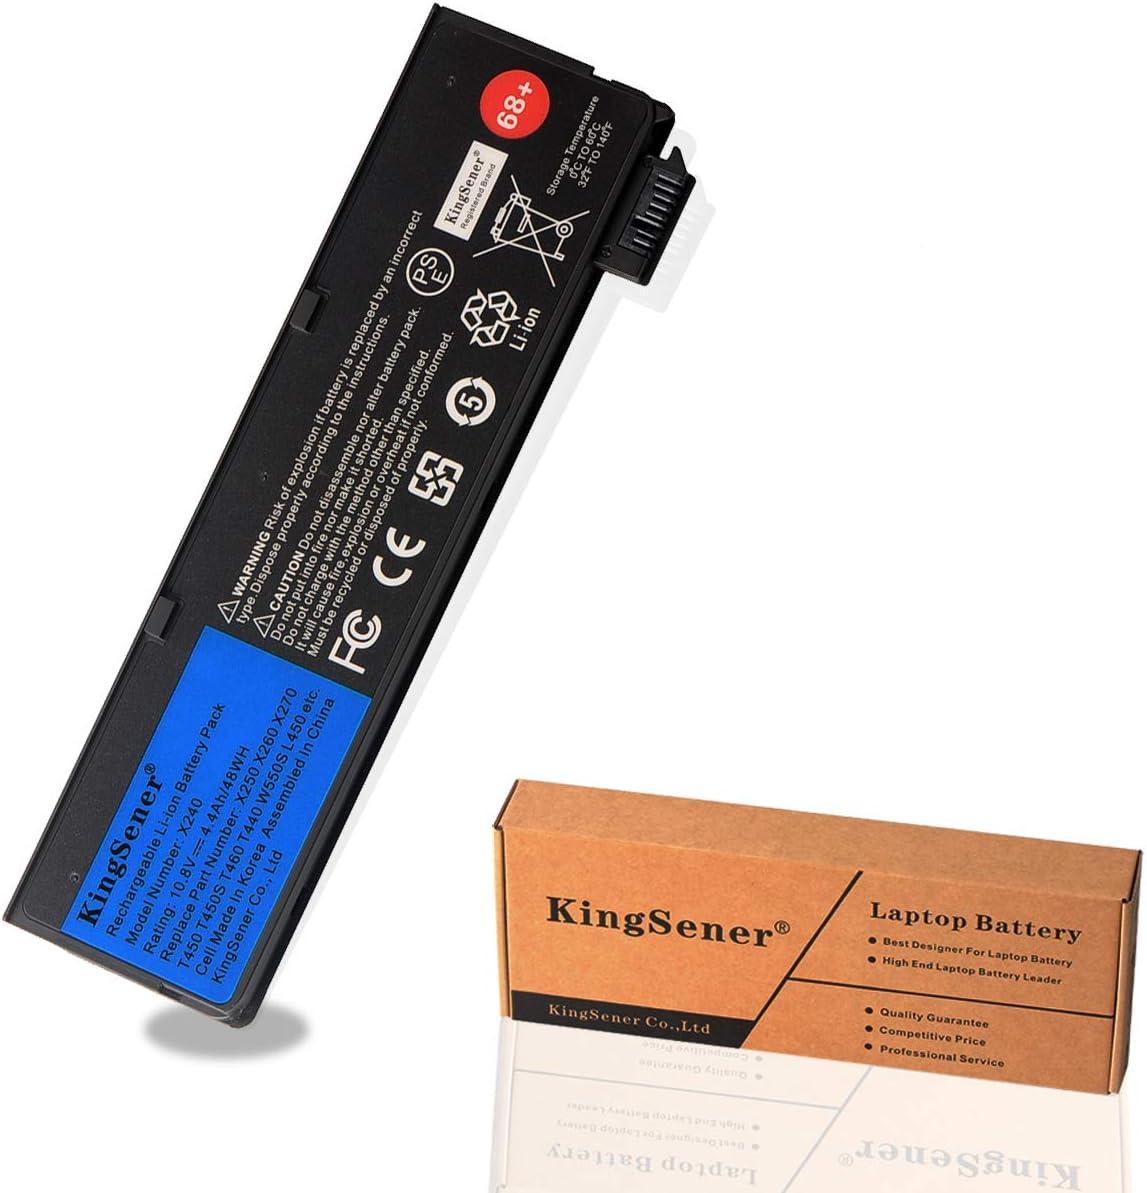 Charlotte Mall KingSener 45N1125 45N1126 45N1127 45N1136 compati Gorgeous Laptop Battery